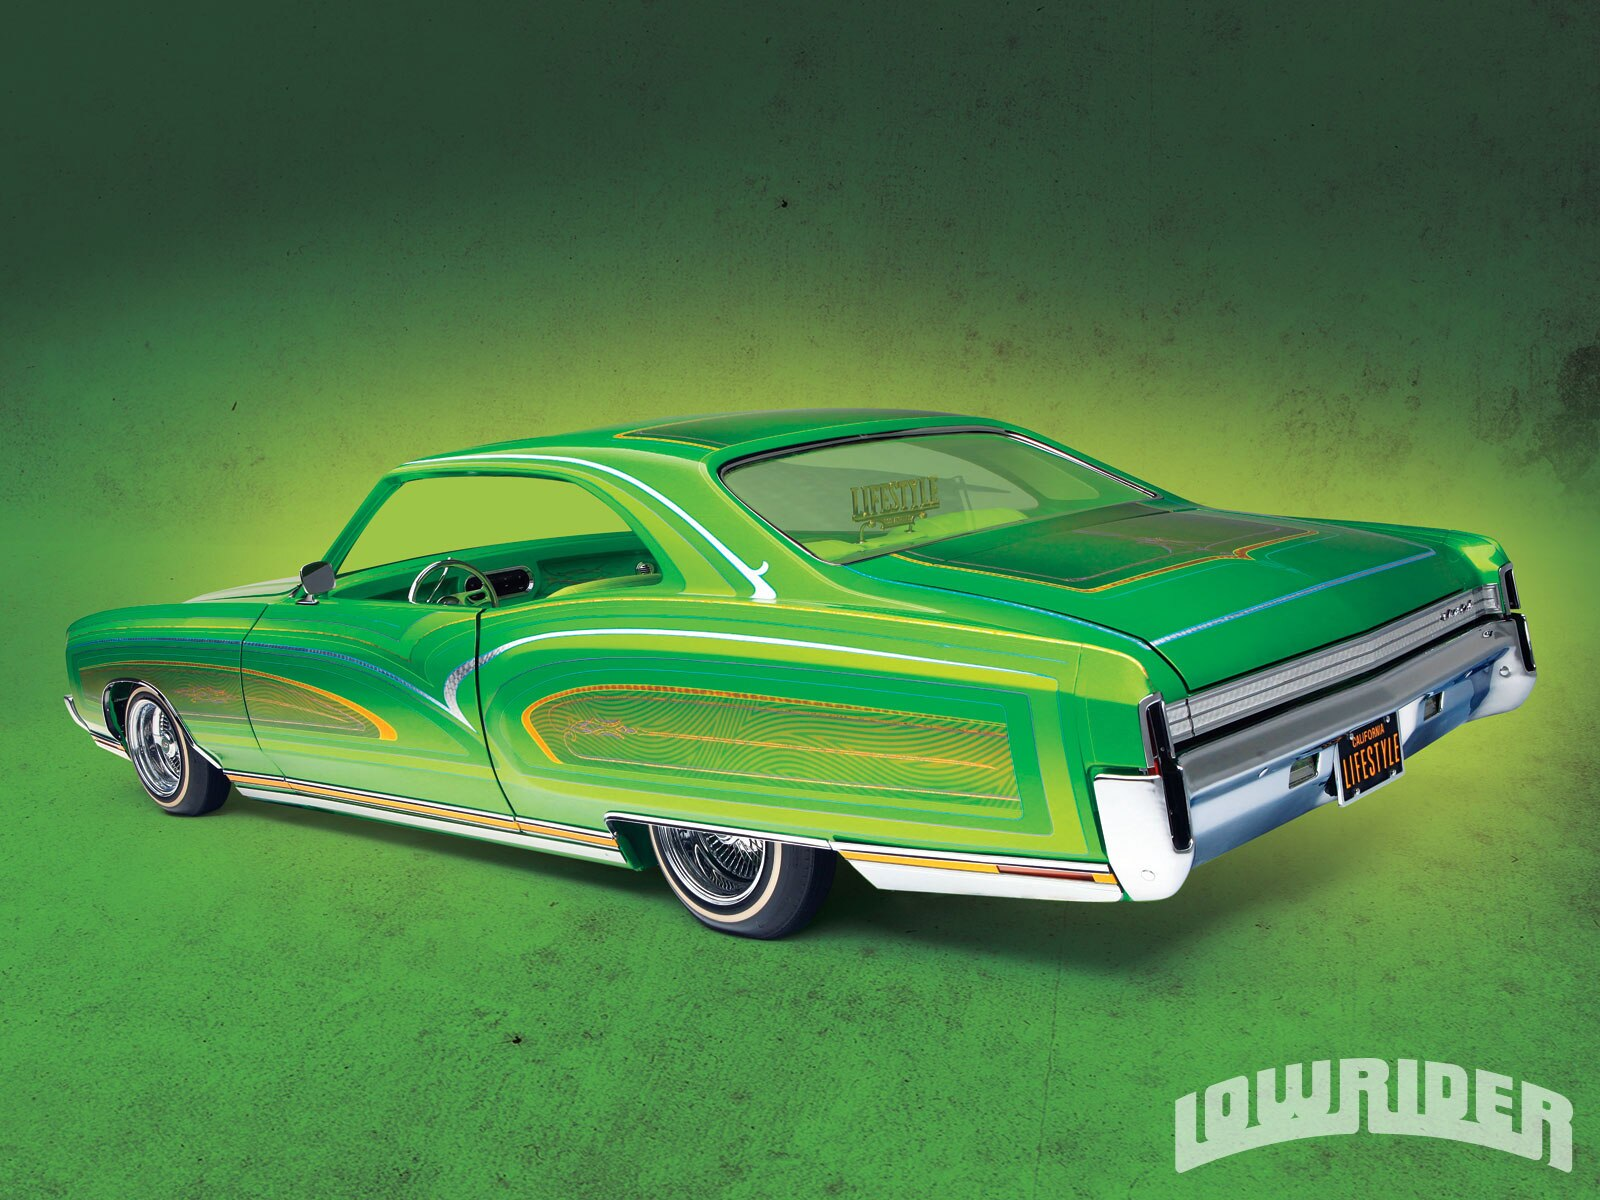 1972 Chevrolet Monte Carlo Lowrider Magazine